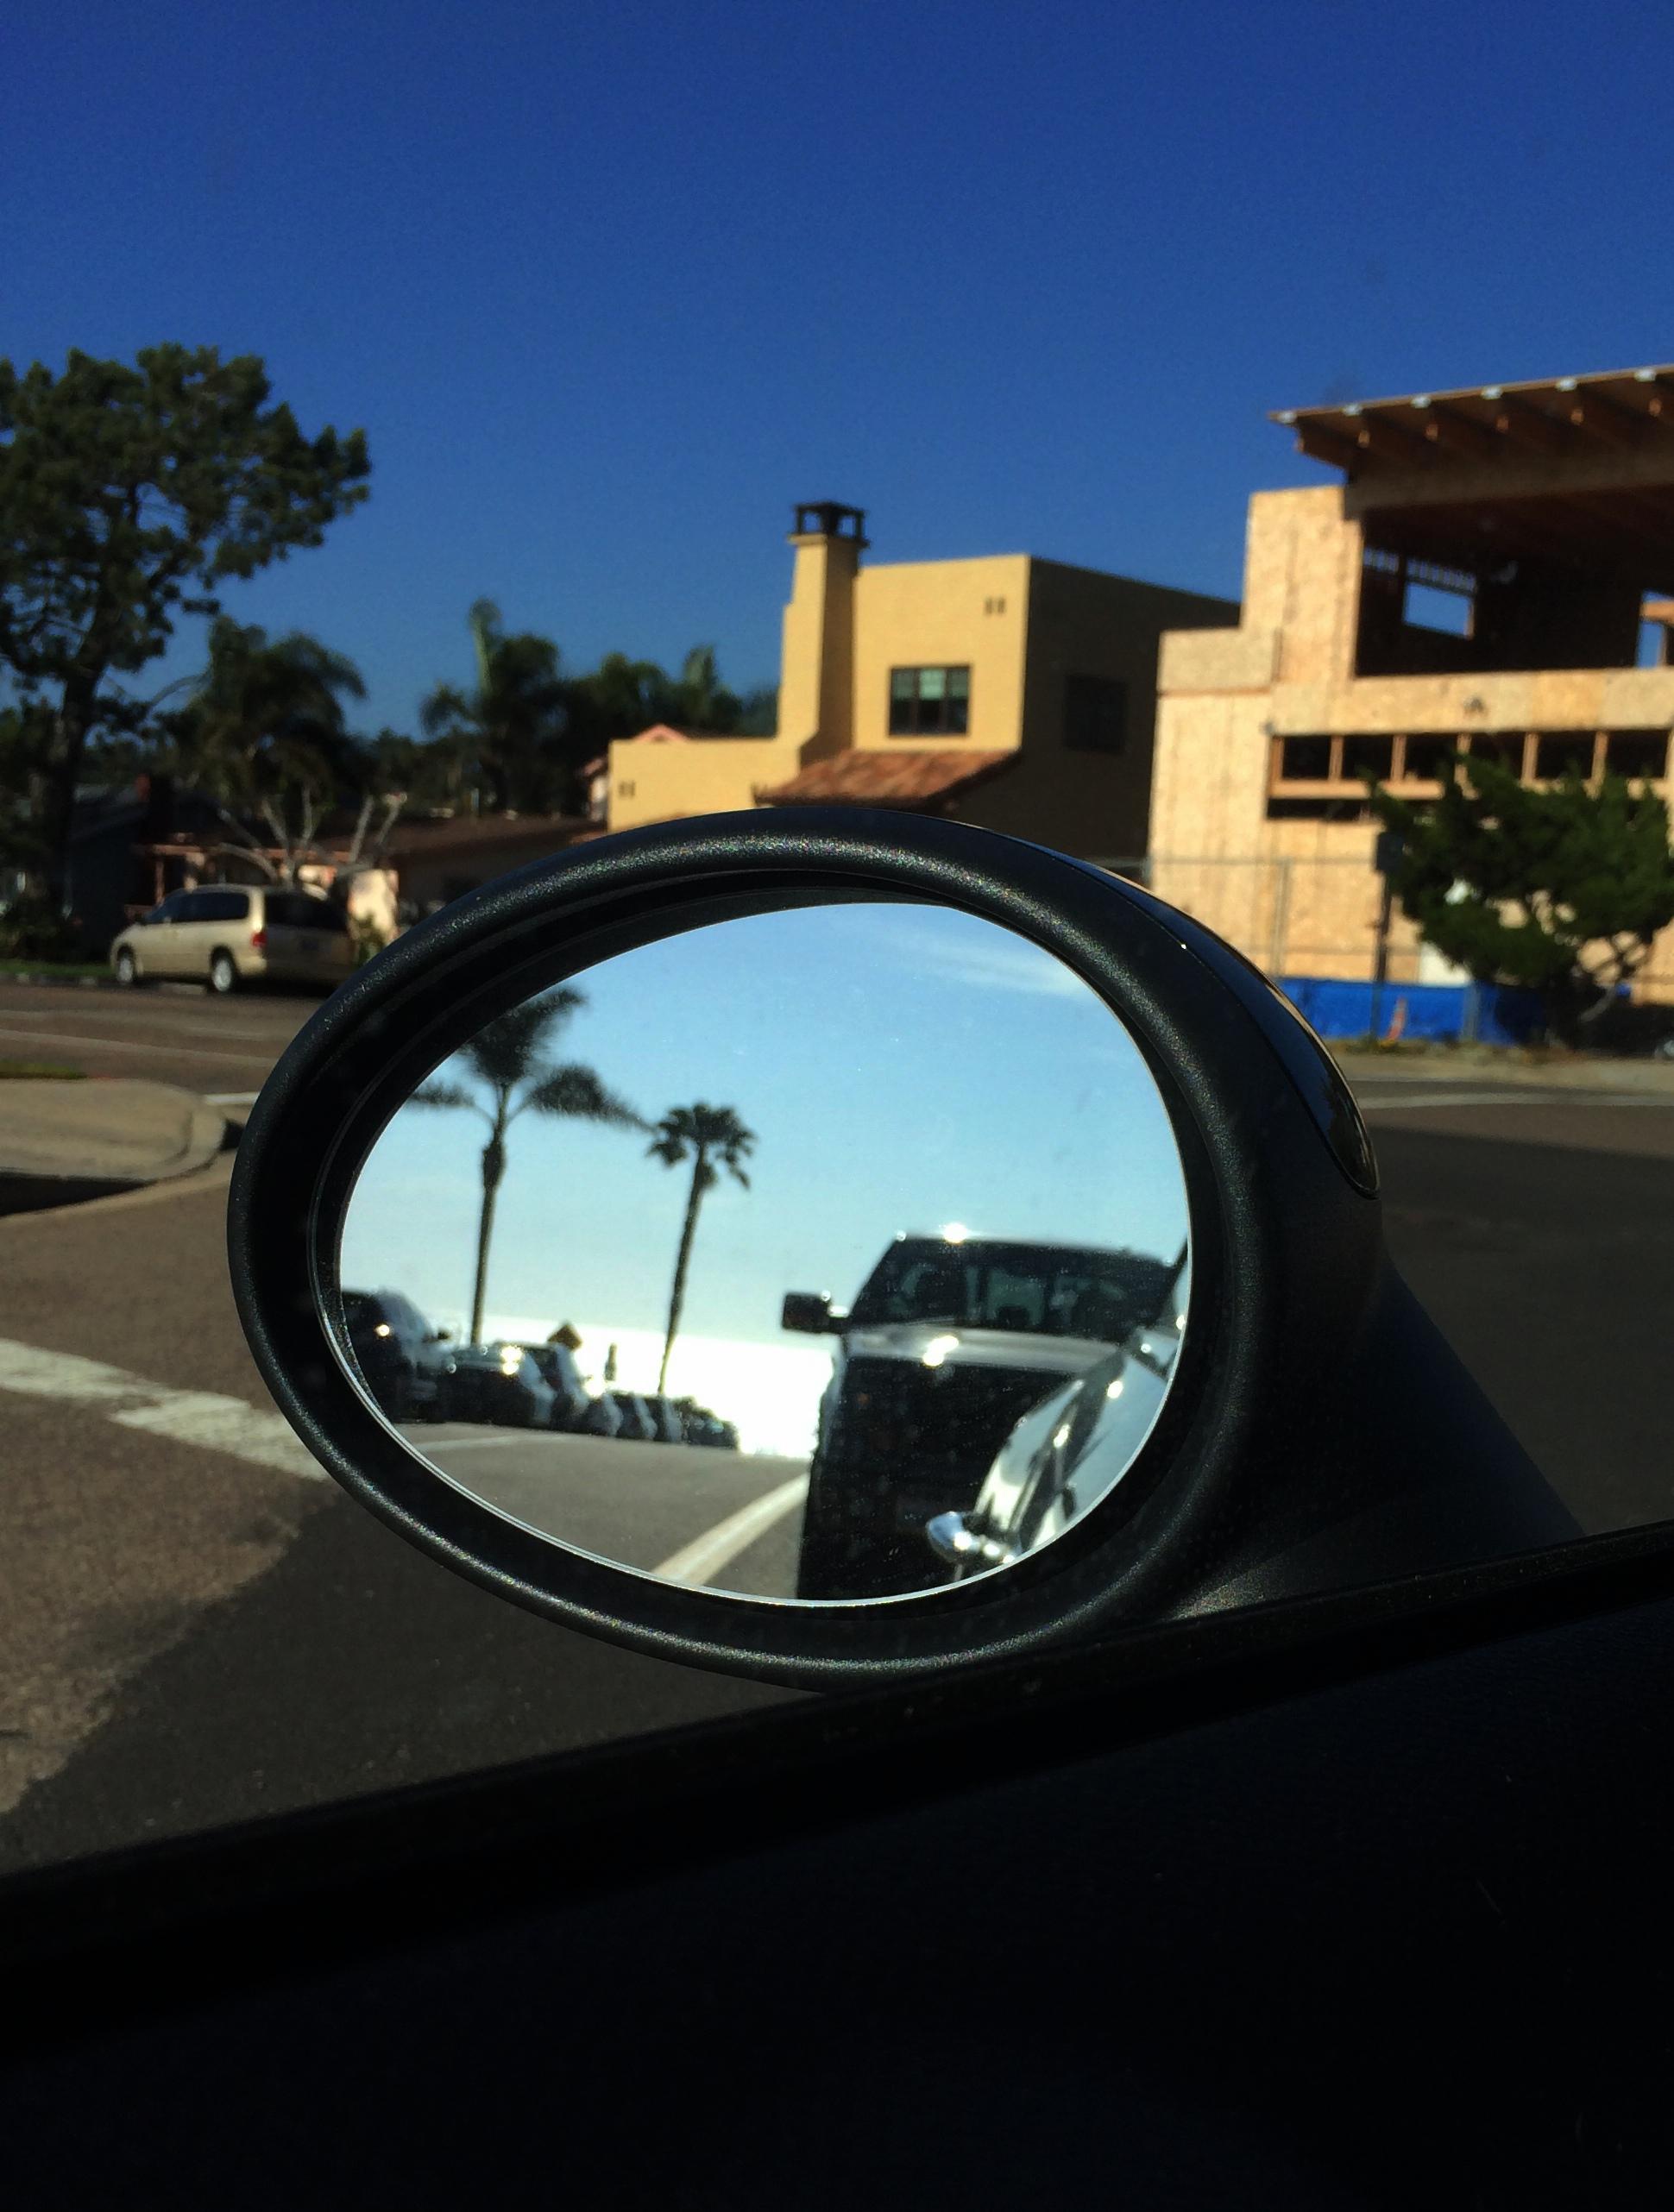 ocean in the mirror